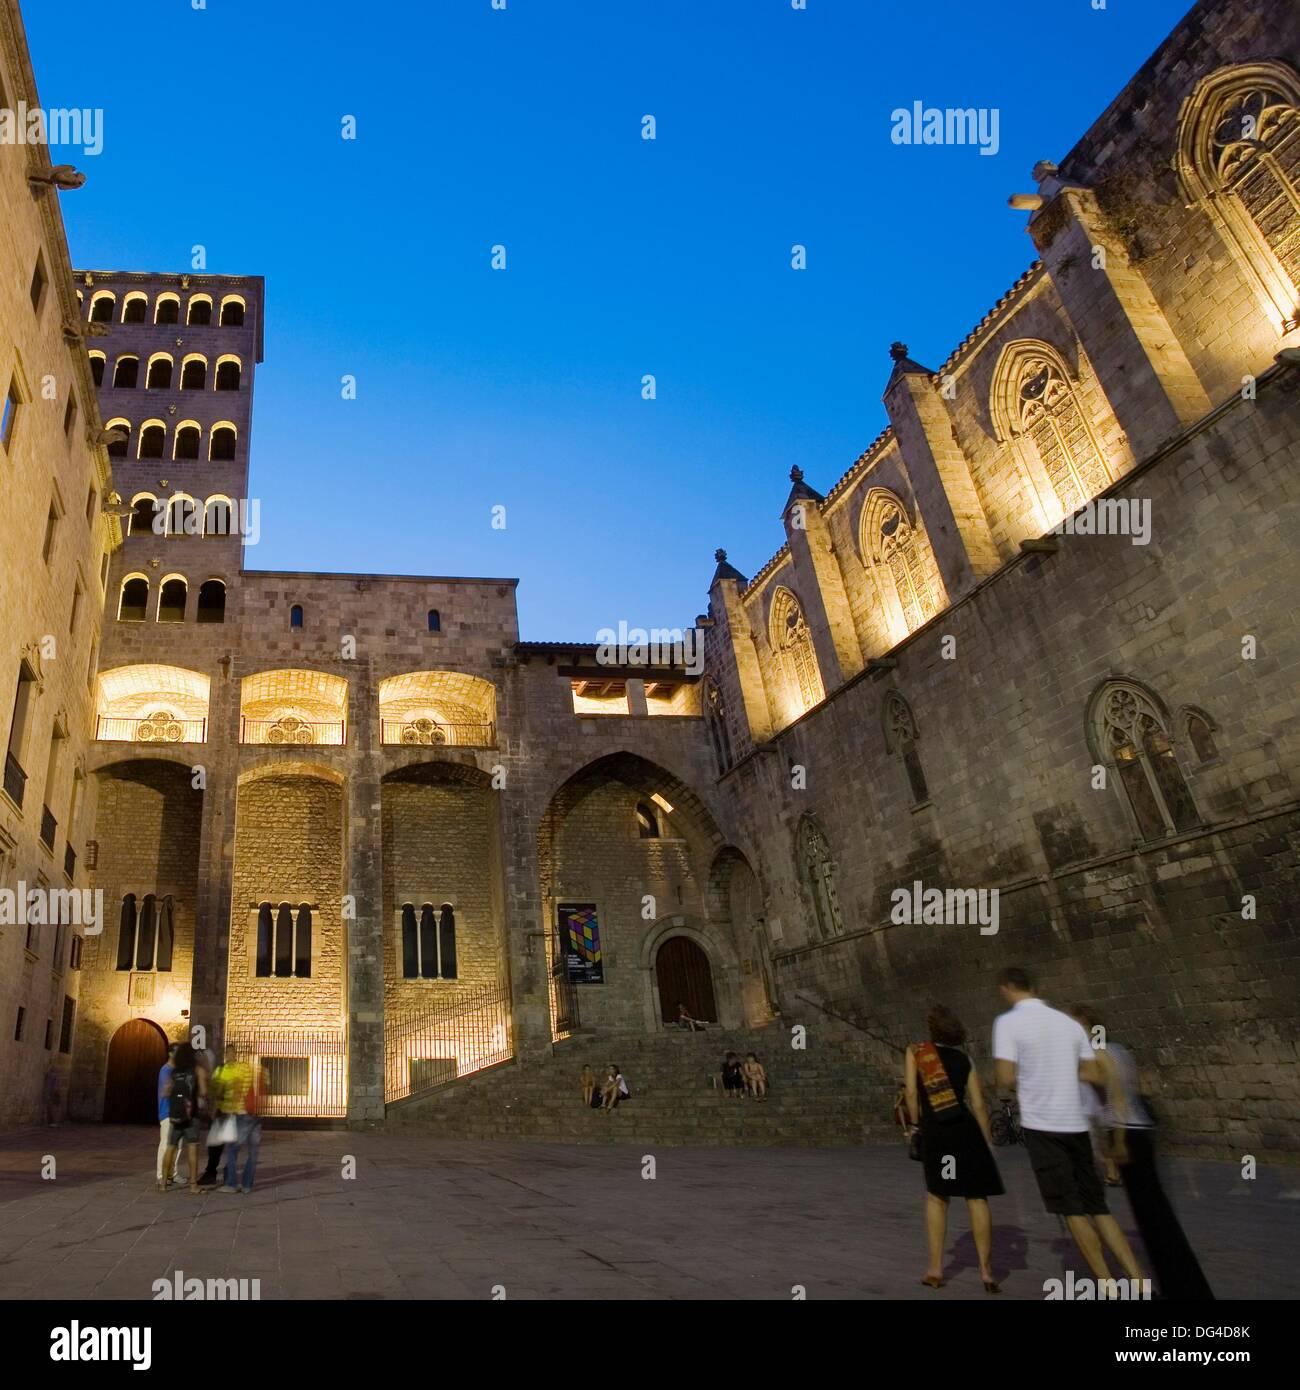 Palau Reial Mayor, Santa Agatha Chapel, Placa del Rei. Barri Gotic. Barcelona. Catalonia. Spain. - Stock Image